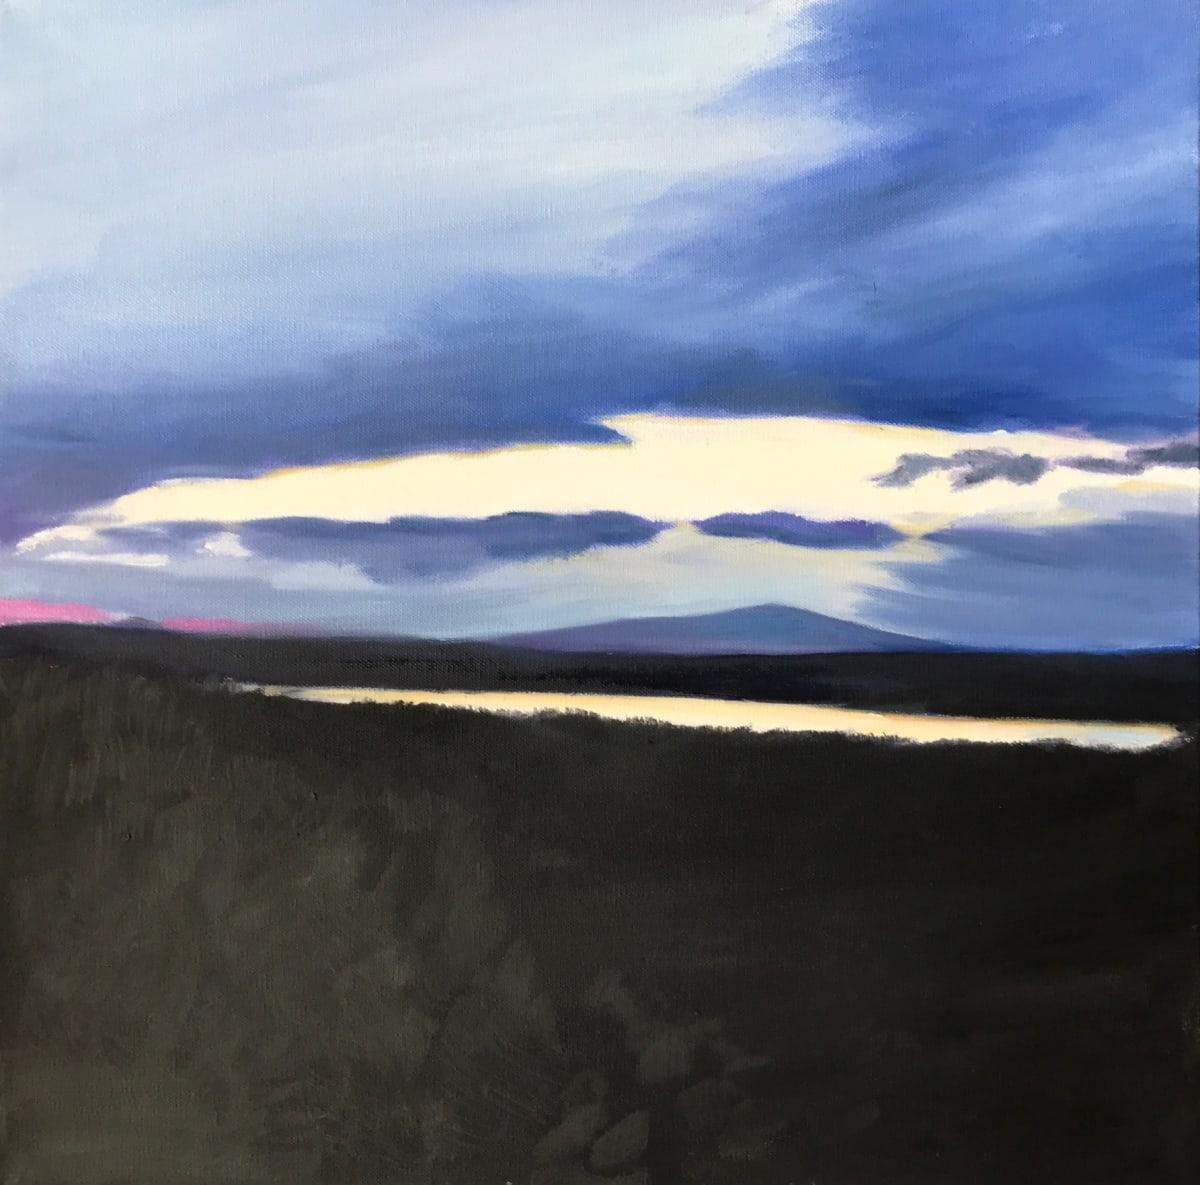 Sunset over Cadillac Mountain by John Attanasio